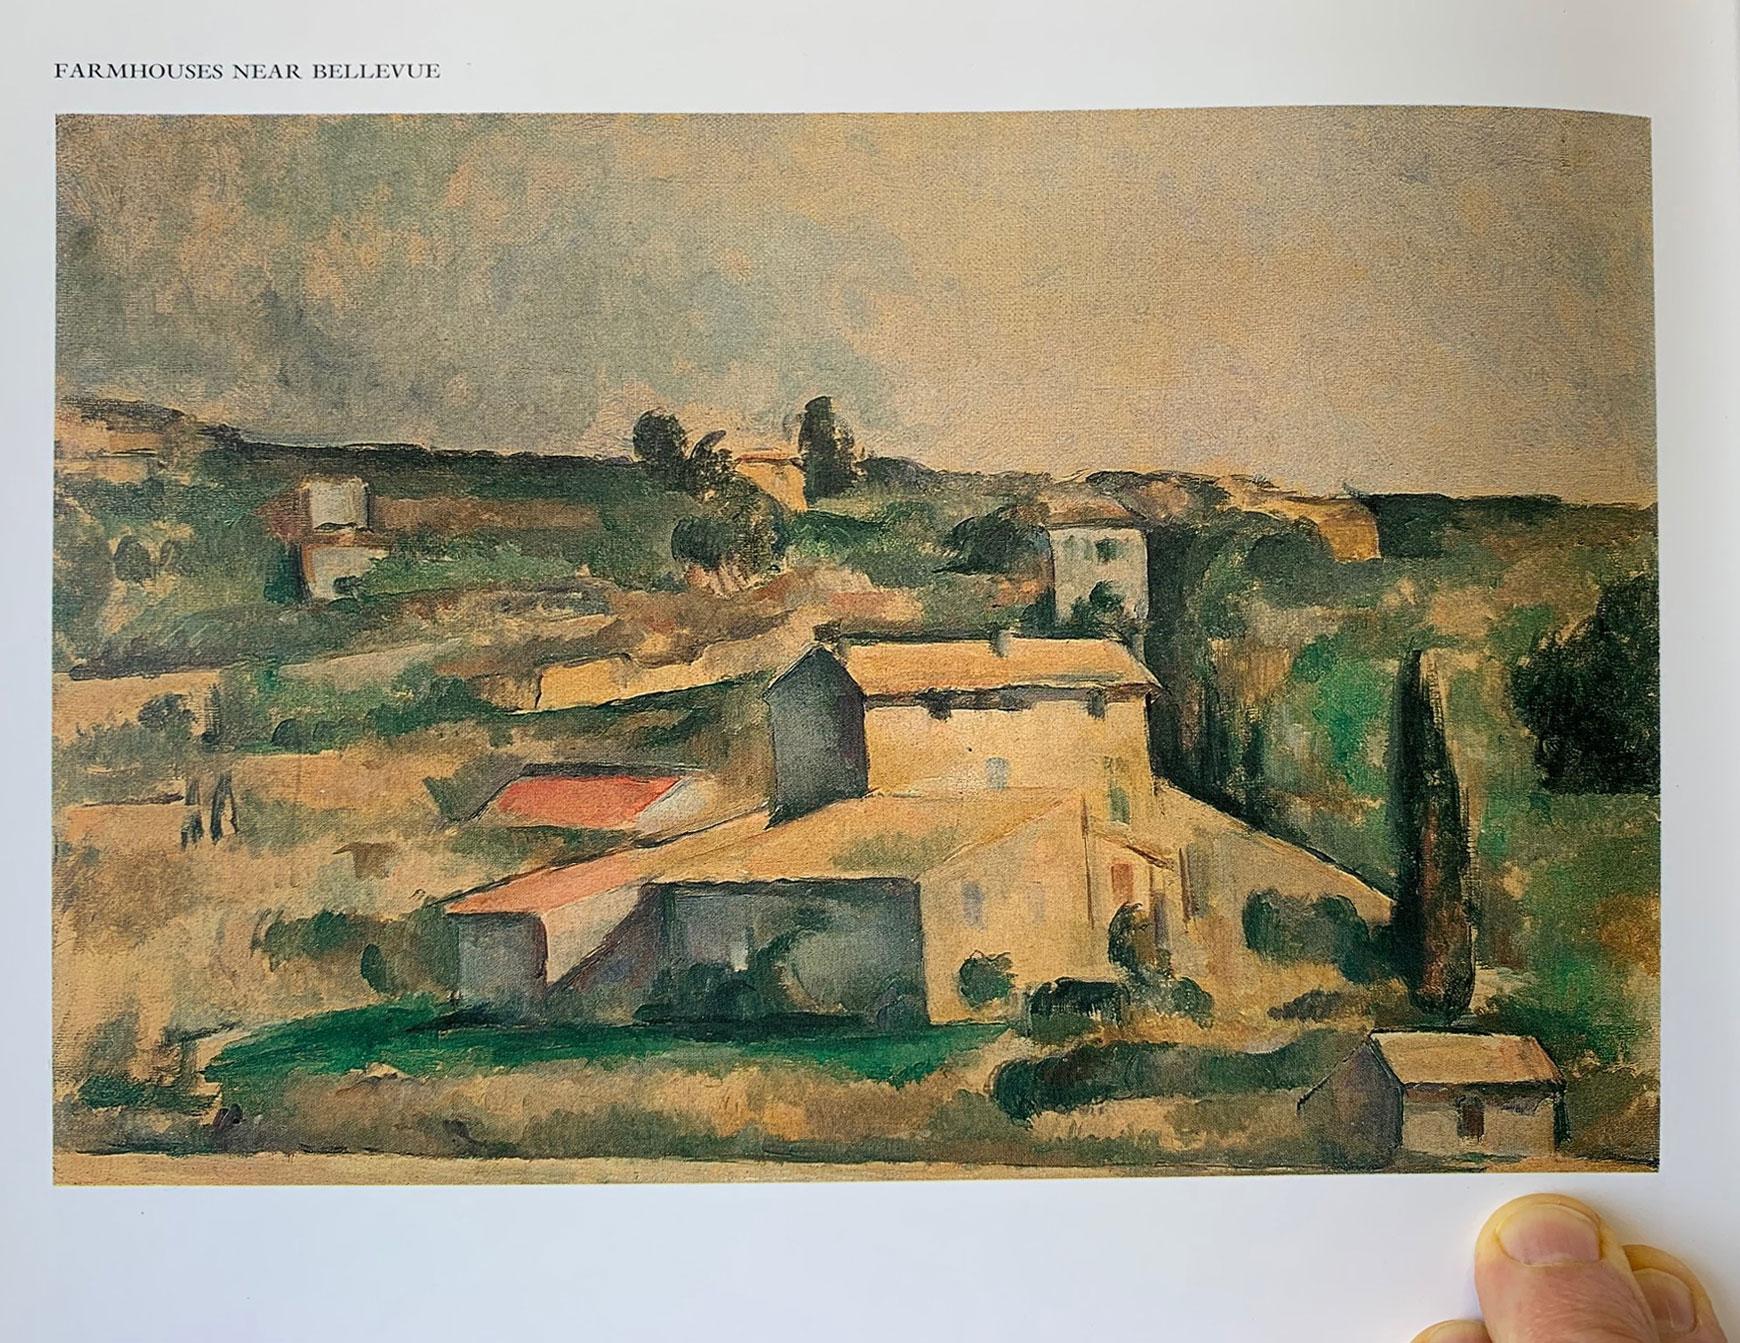 Farmhouses near Bellevue, Paul Cézanne